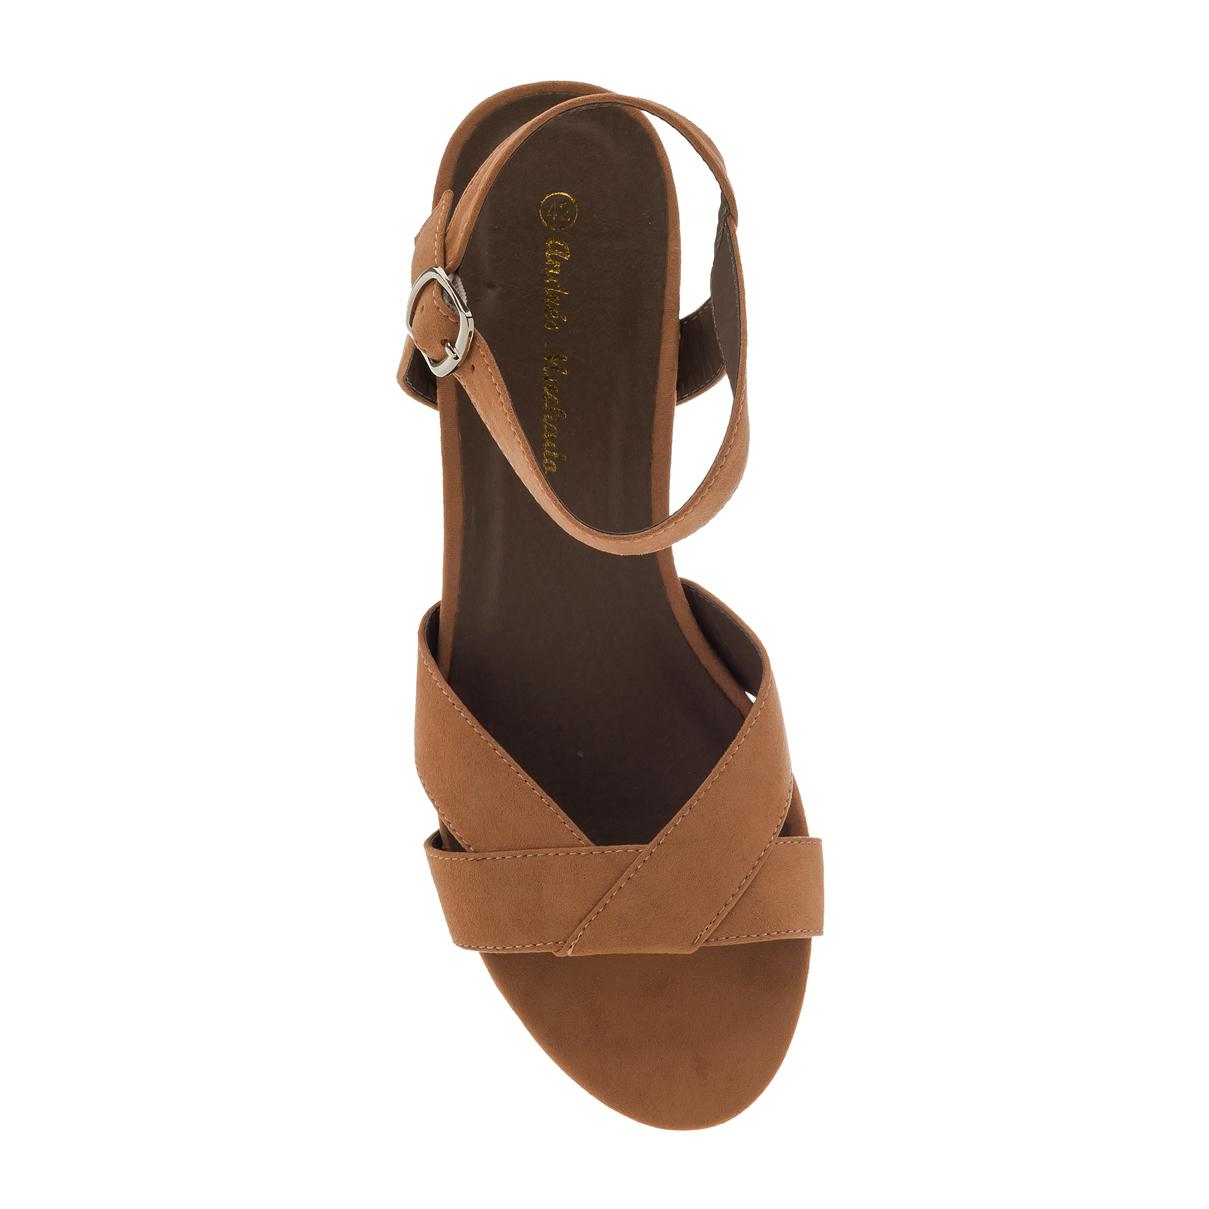 Antilop sandale sa širokom štiklom, braon